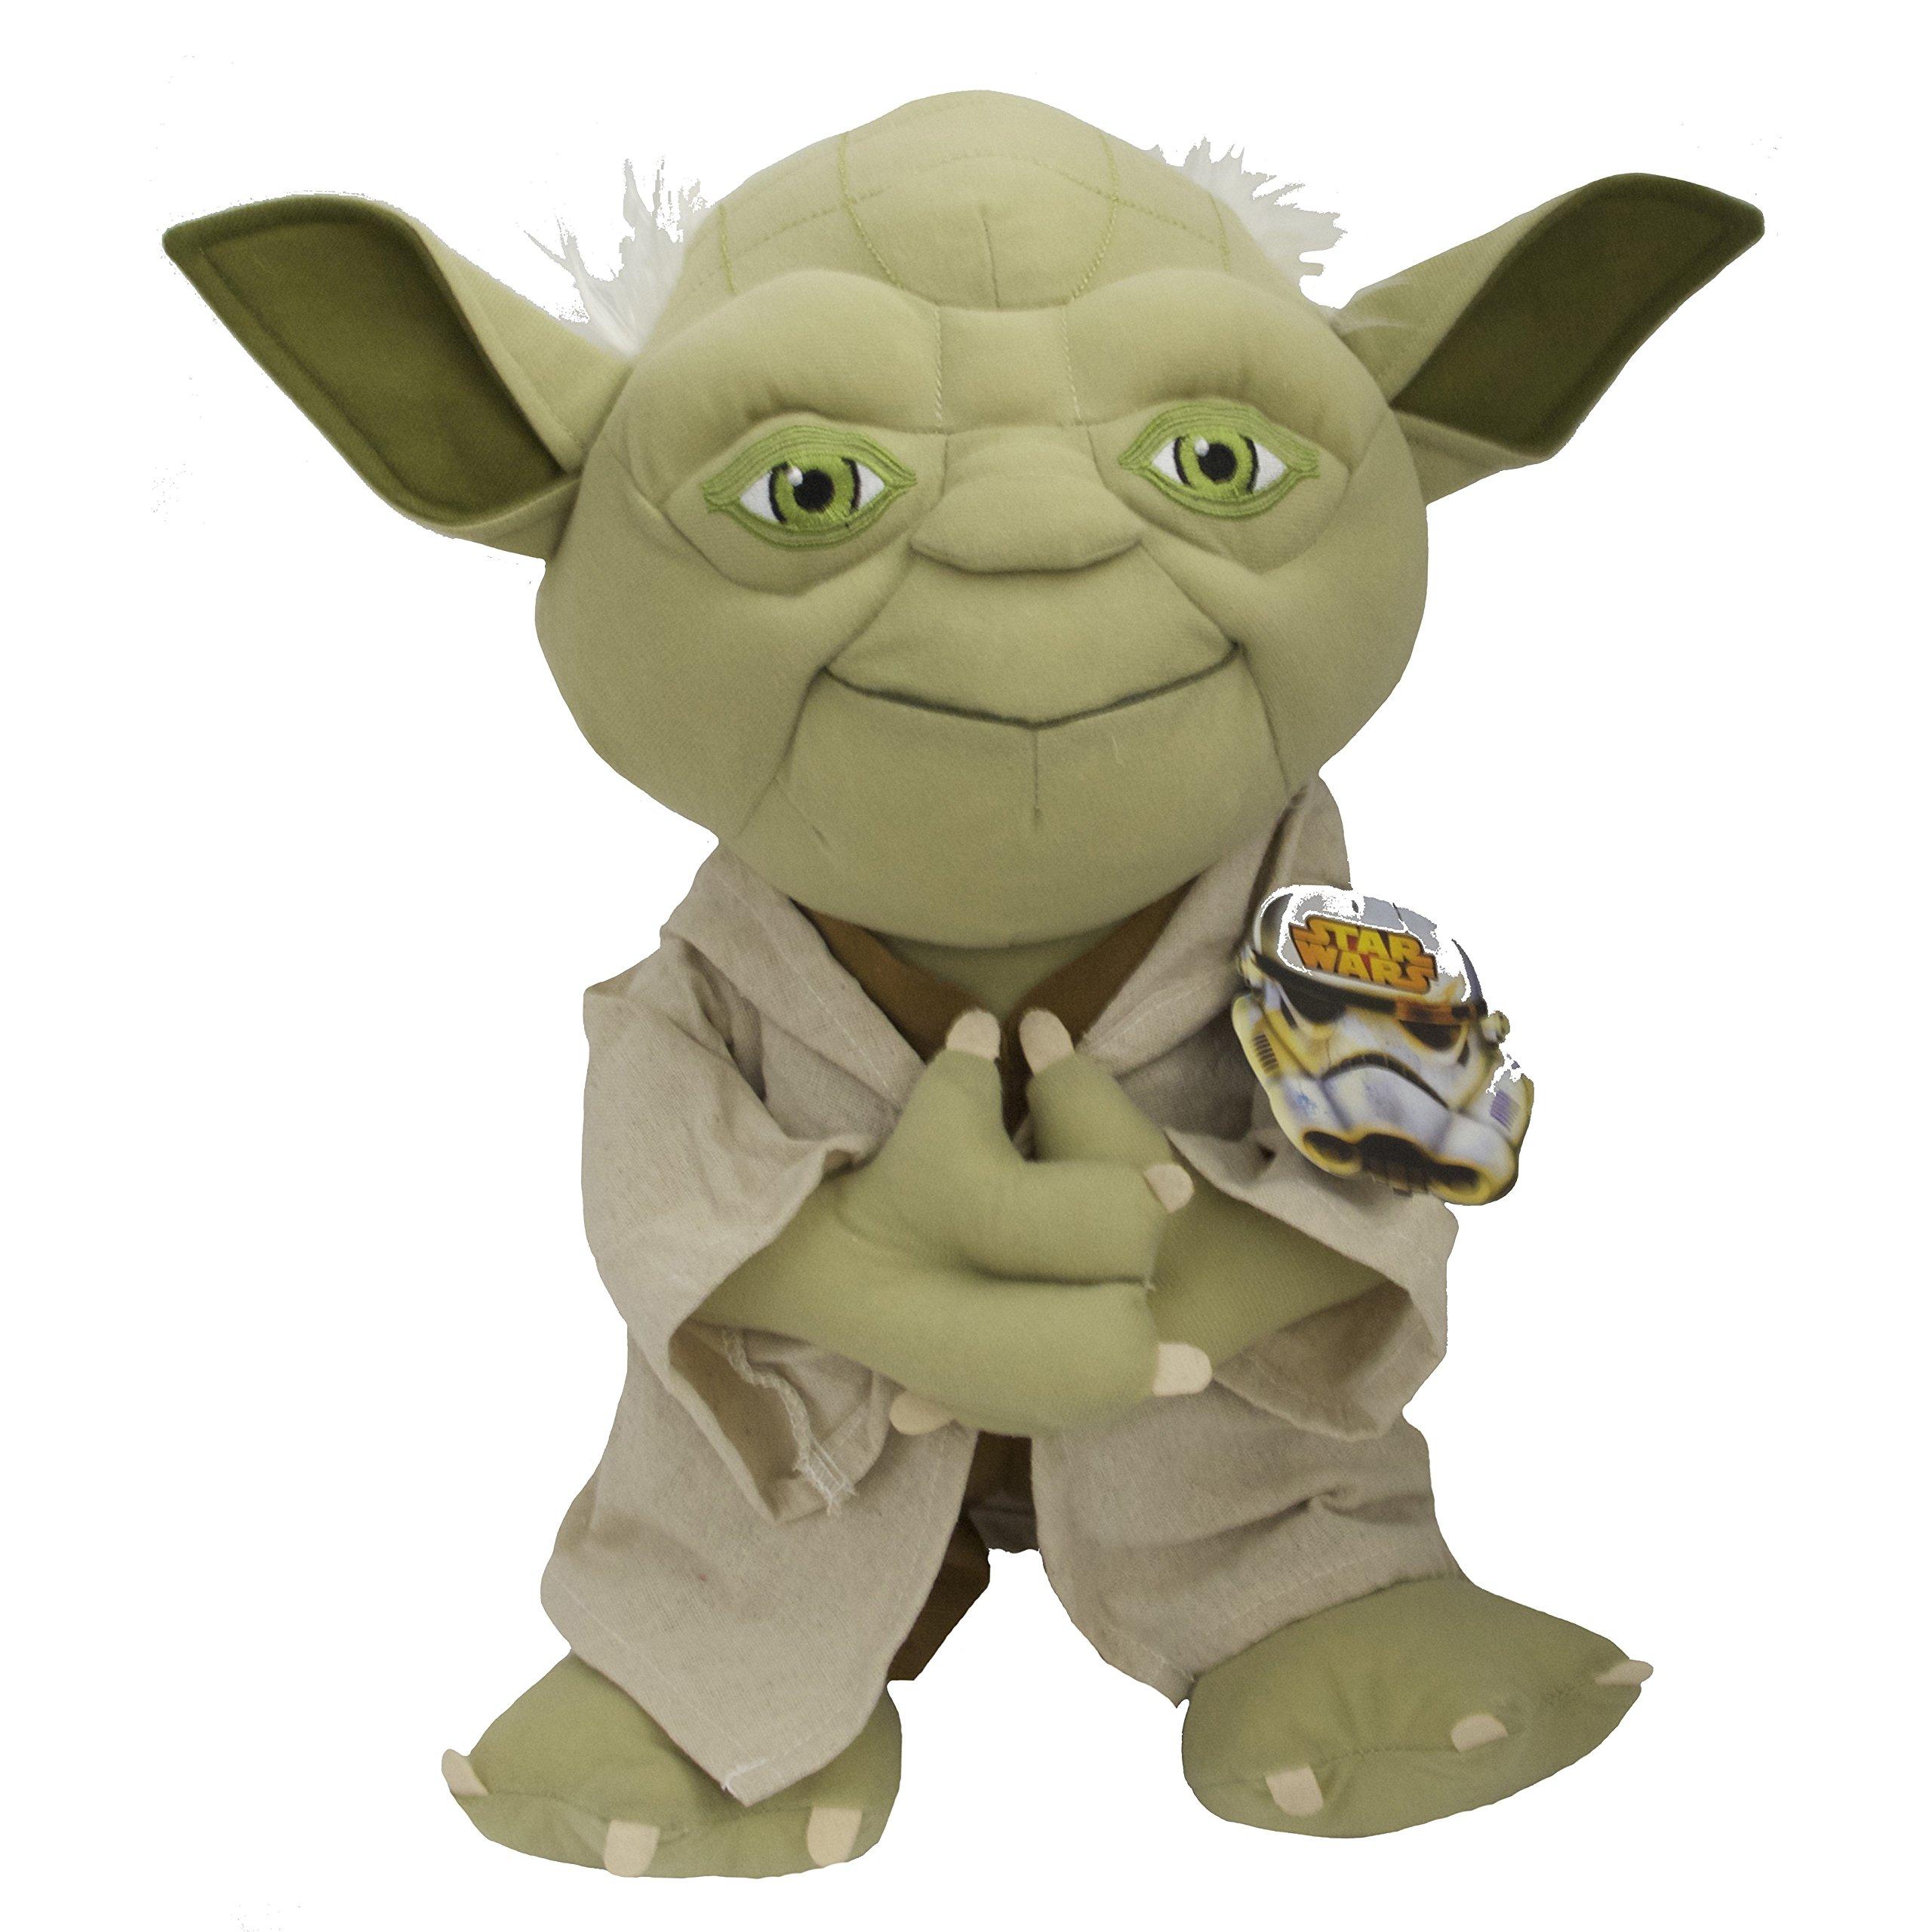 5 Piece Kids Star Wars Themed Comforter Twin Set, Classic Movie Bedding for Star Wars Fans Featuring Darth Vader, R2D2, Luke Skywalker, Grid Pattern, Original Trilogy + Yoda Pillow Doll